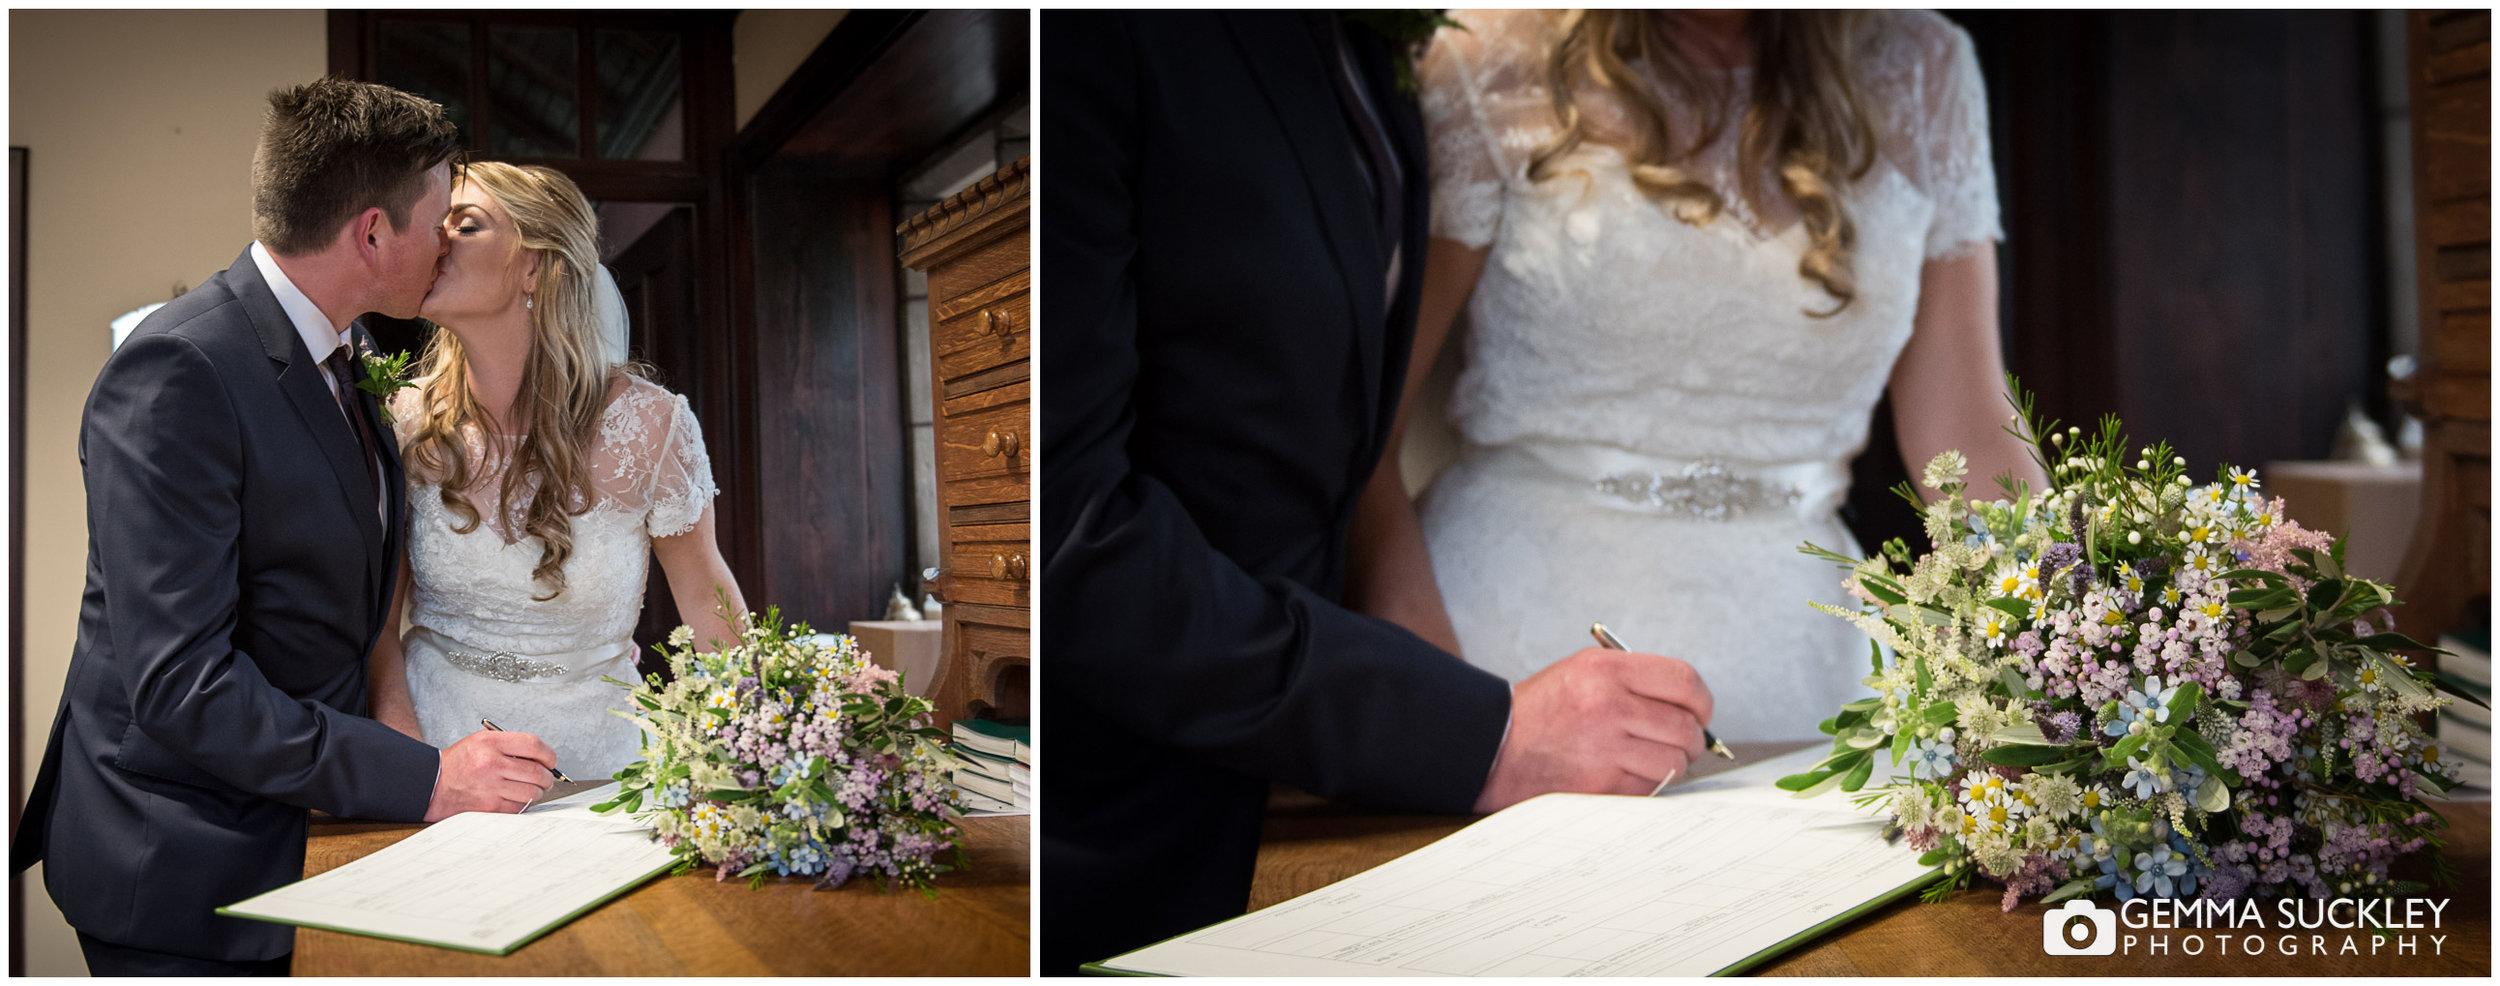 signing-the-register-wedding-photo©gemmasuckleyphotography.JPG